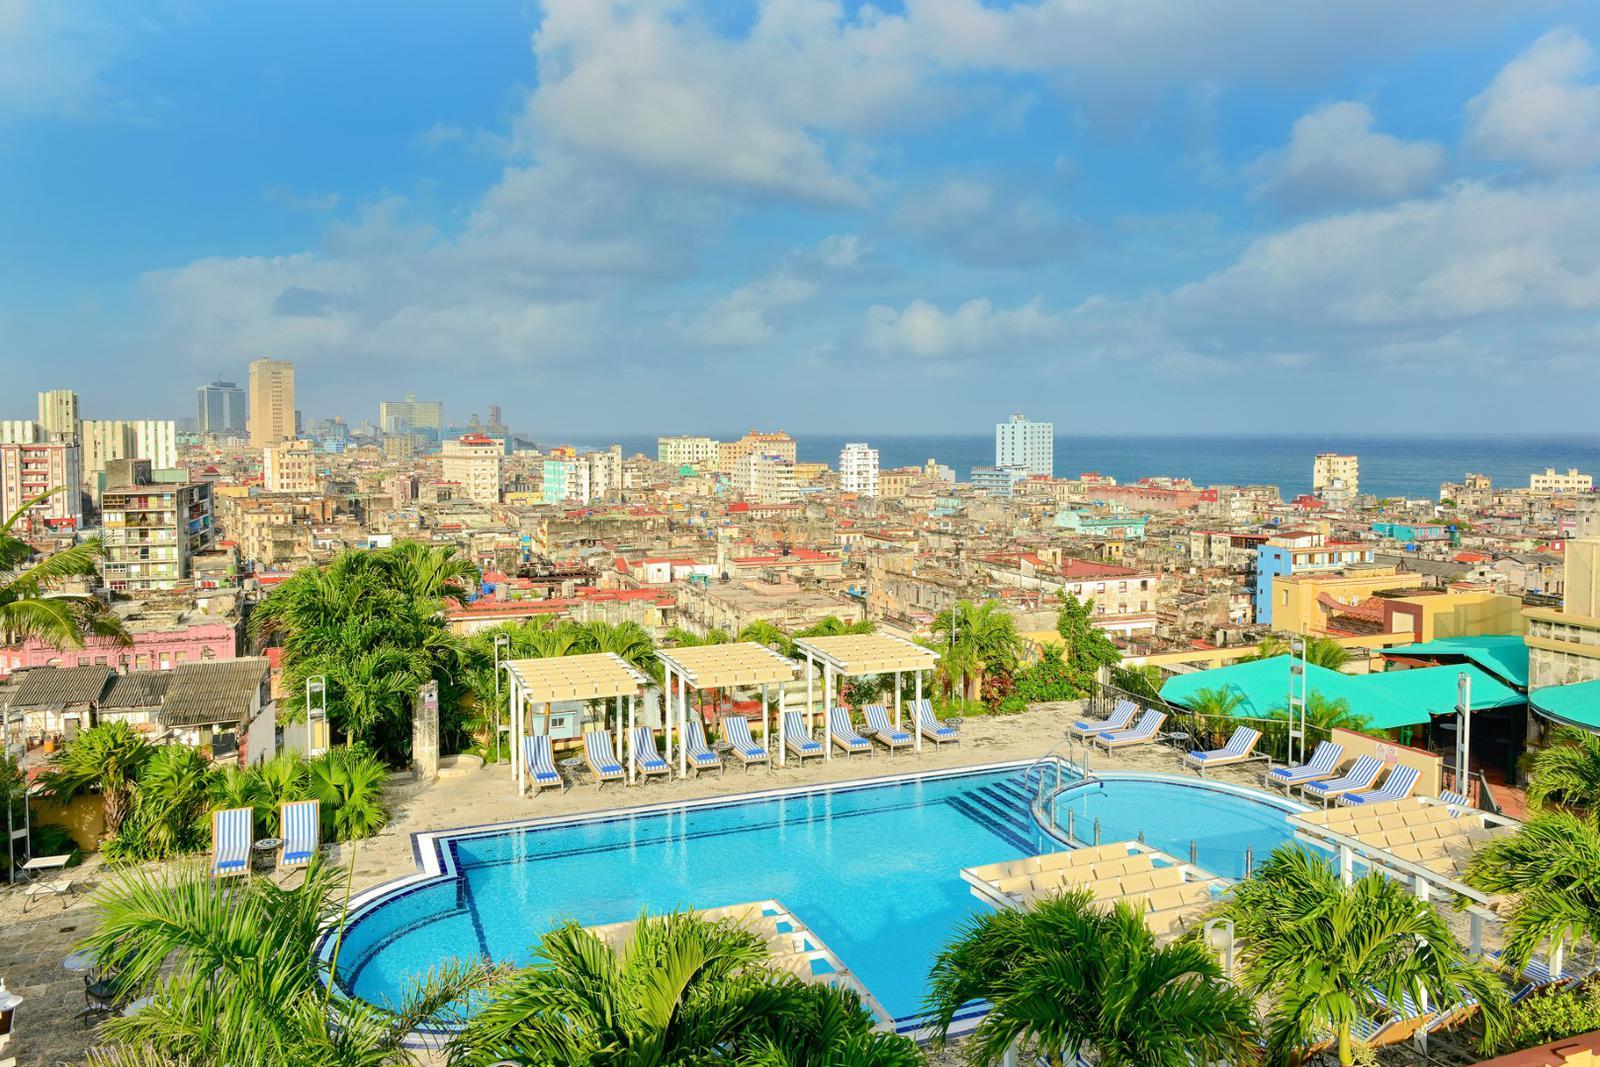 mejores terrazas de hoteles Iberostar la habana